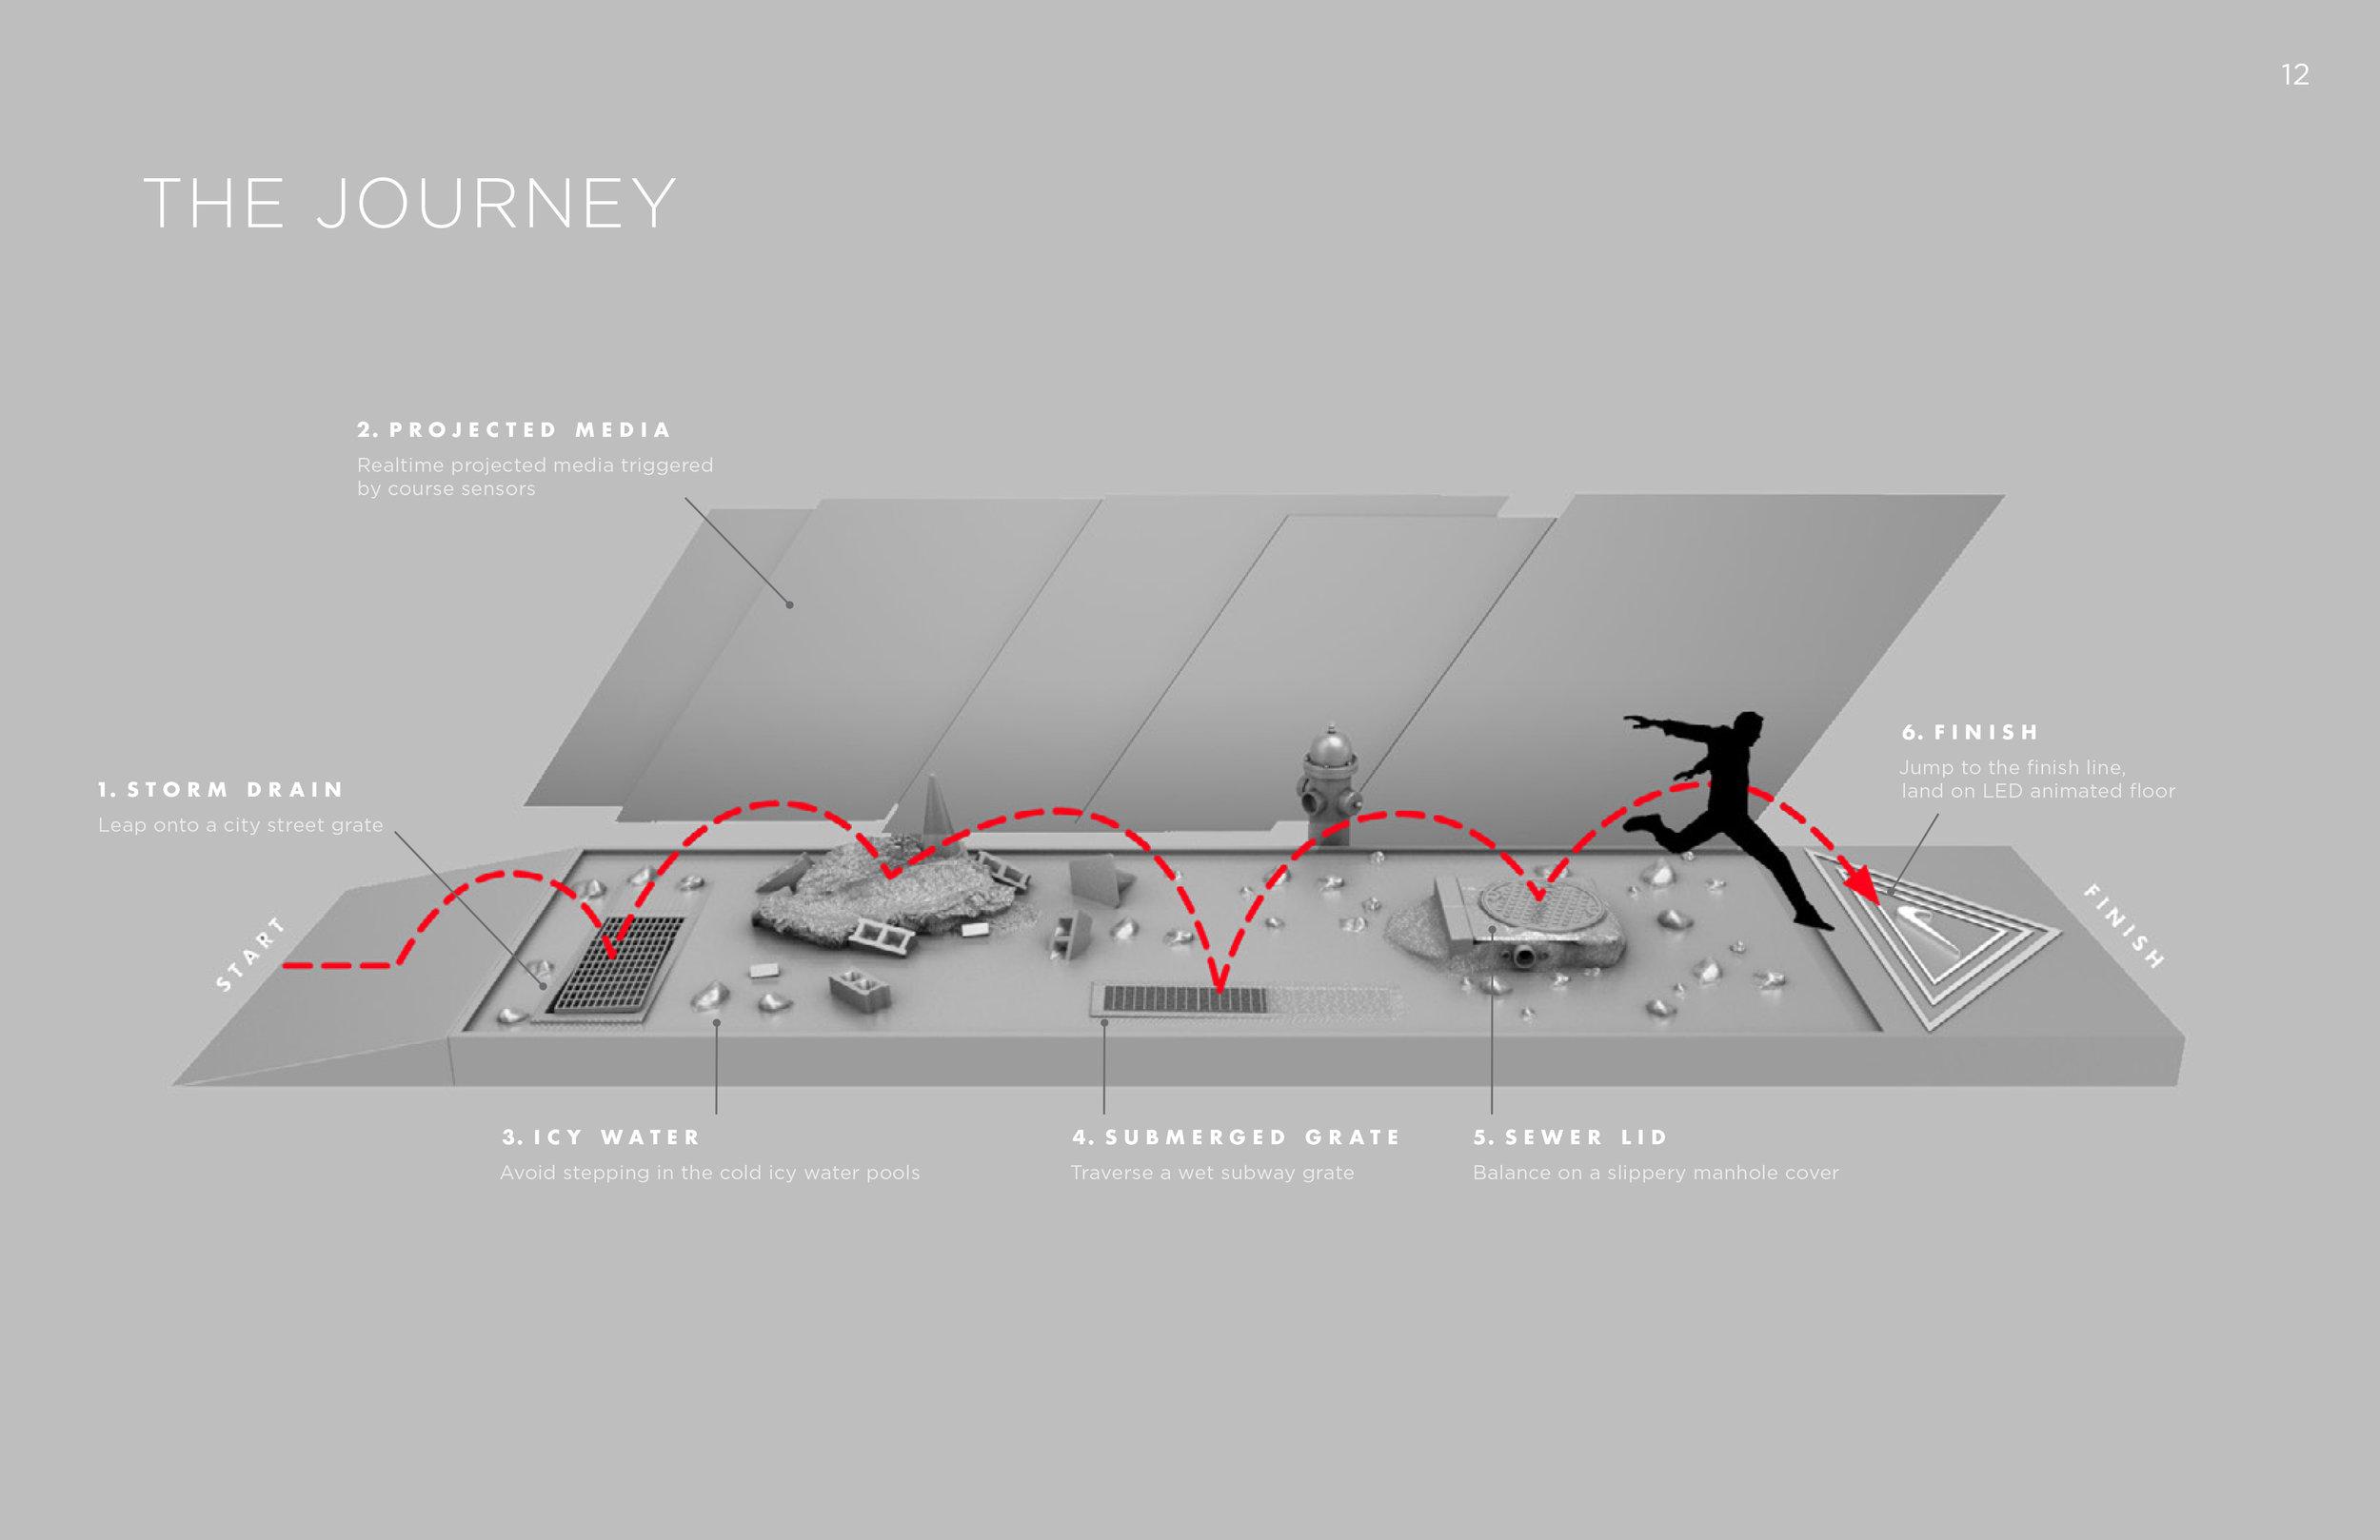 Lvthn_Nike_SneakerBoots_Test_Stride_v14-12.jpg